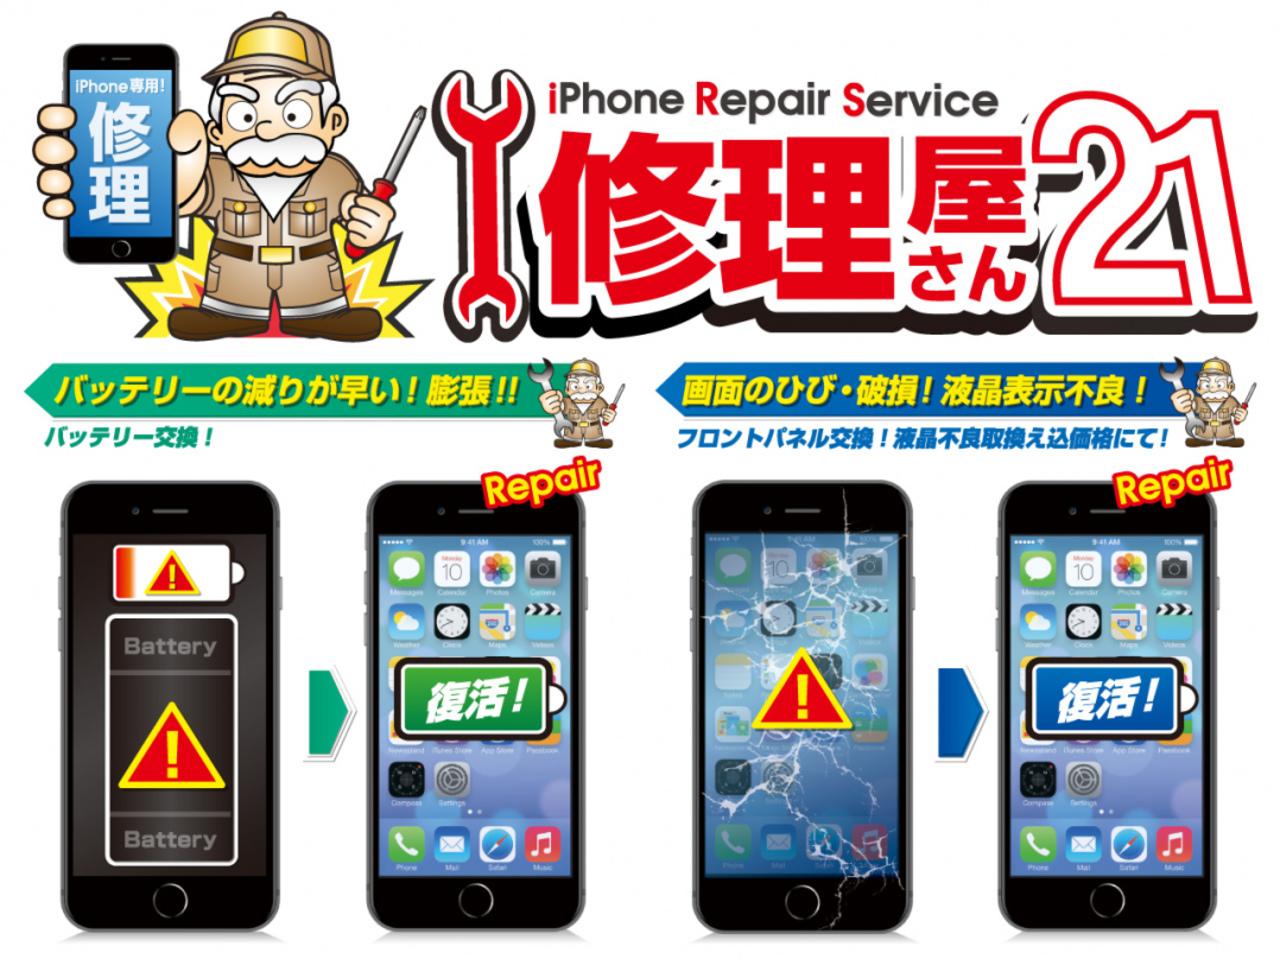 iPhoneバッテリー交換 即日対応|はんこ屋さん21 武蔵小山店